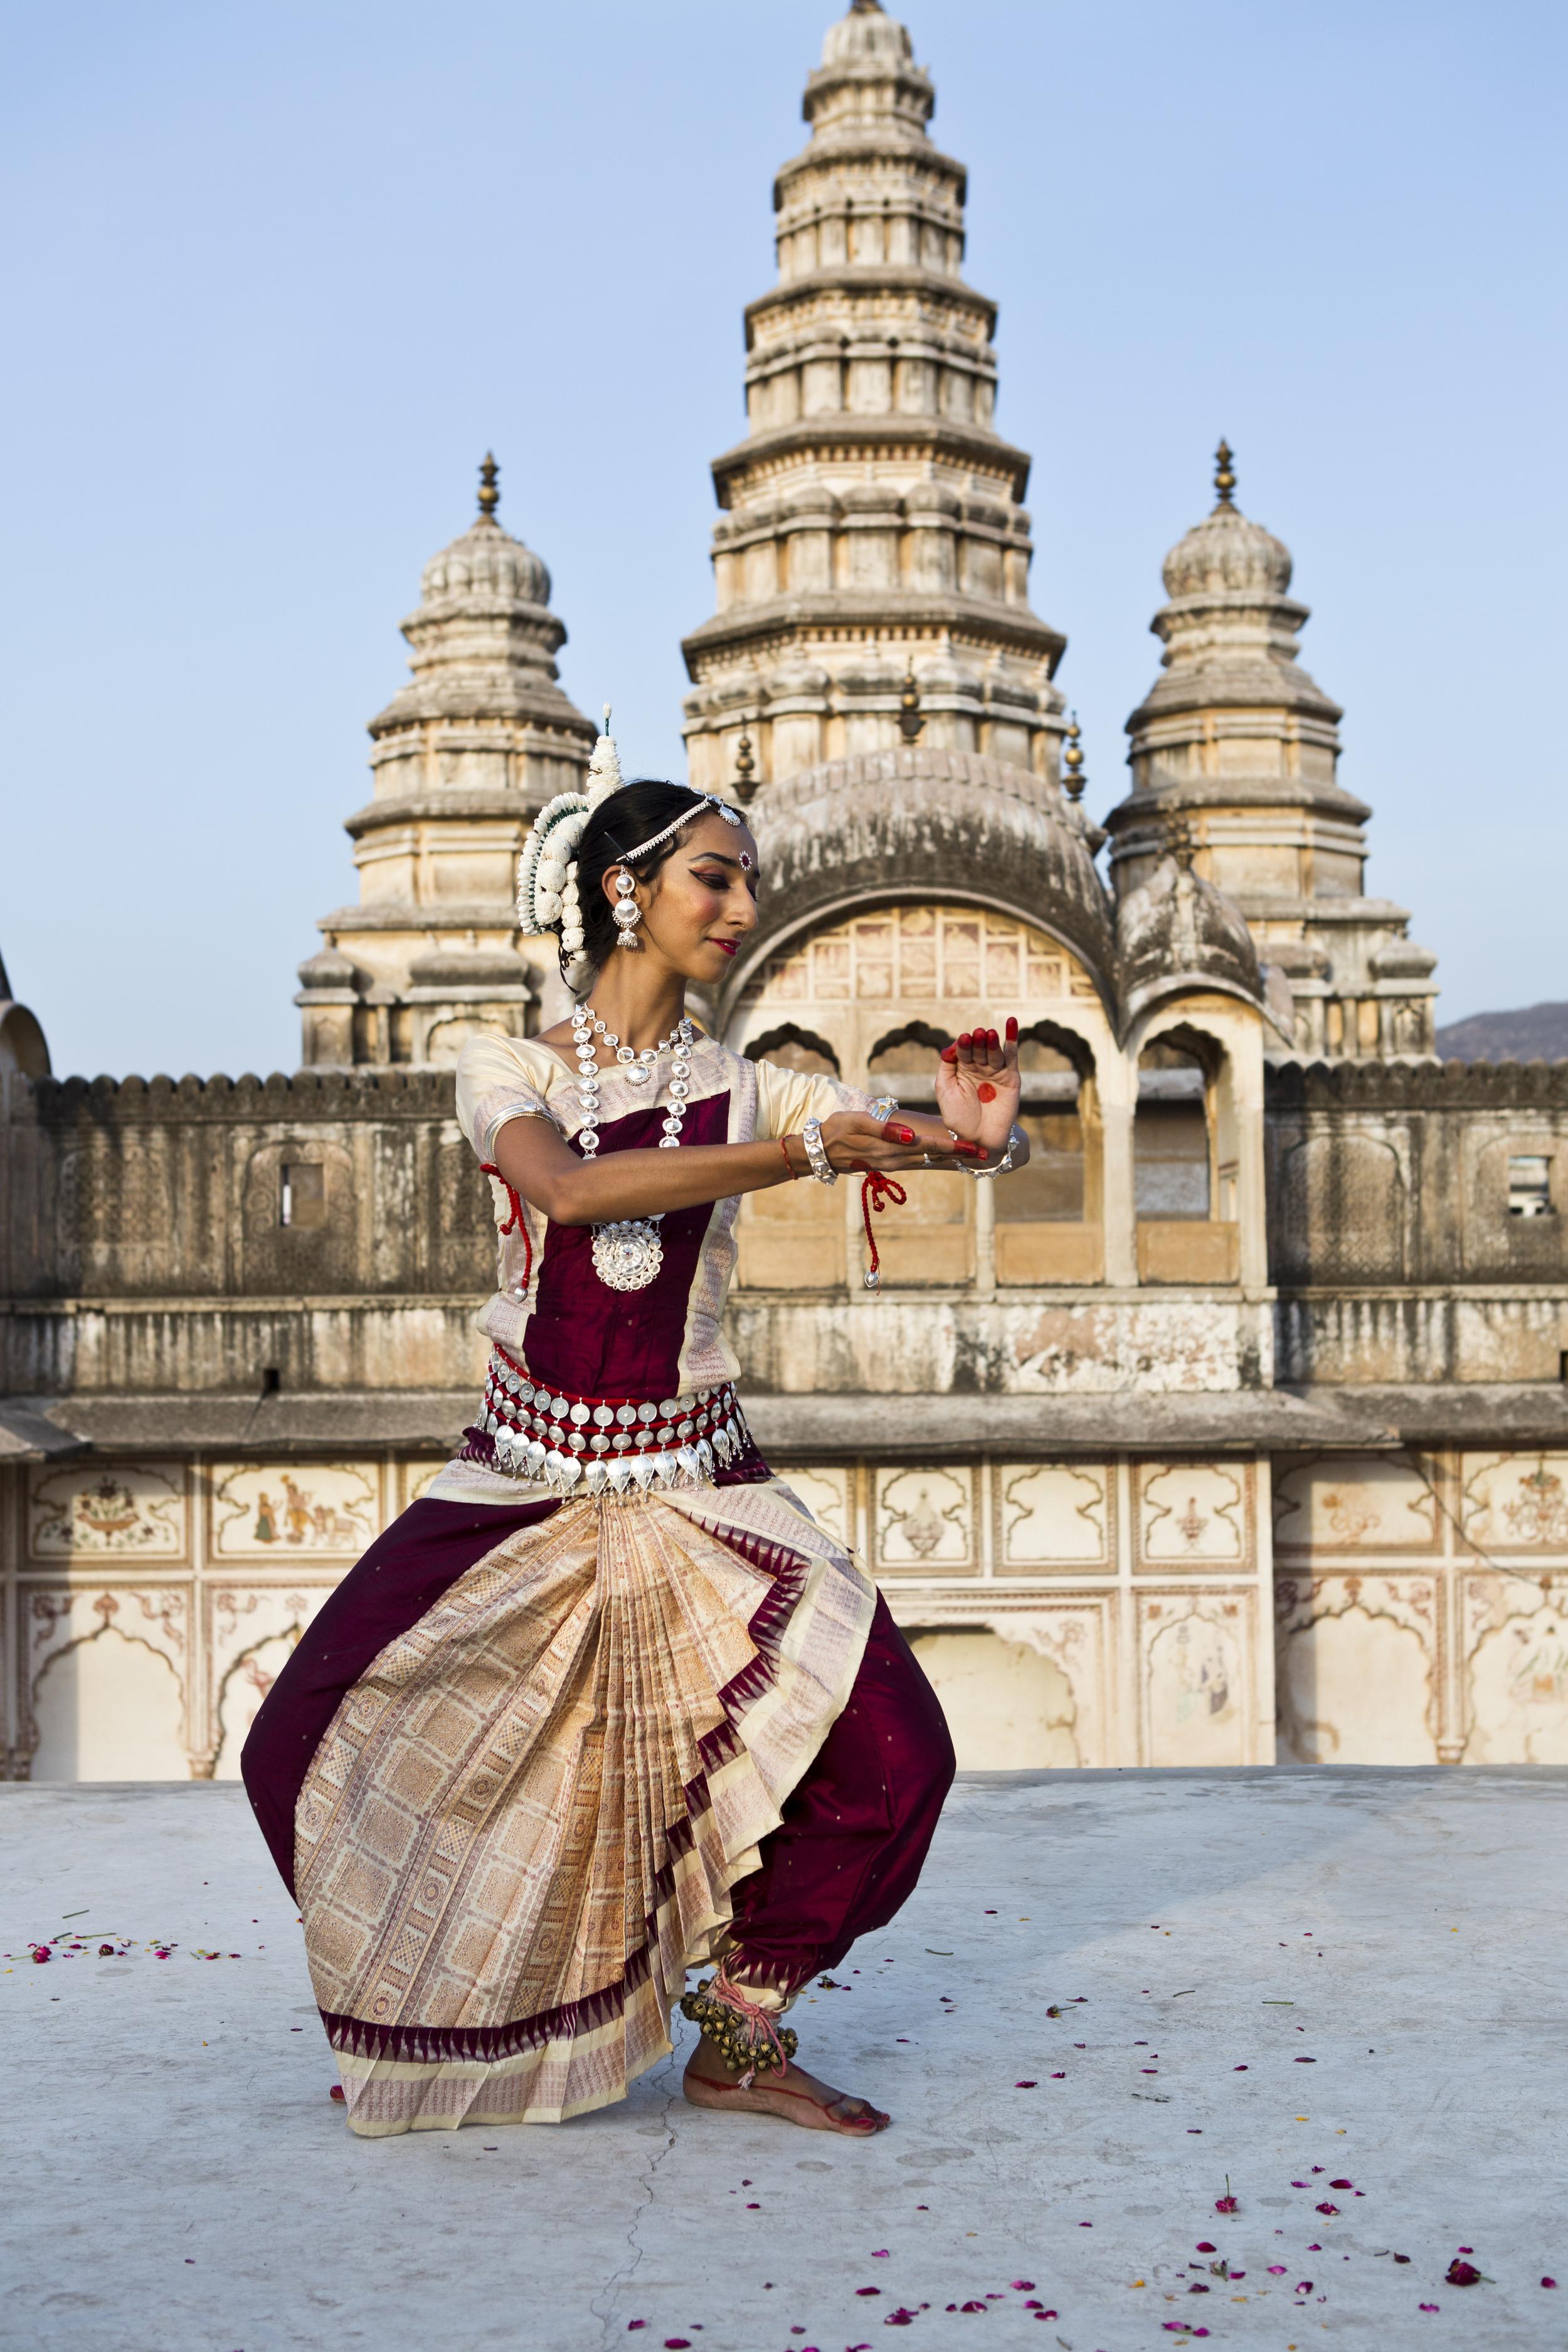 Shakti School of Dance, April 2013